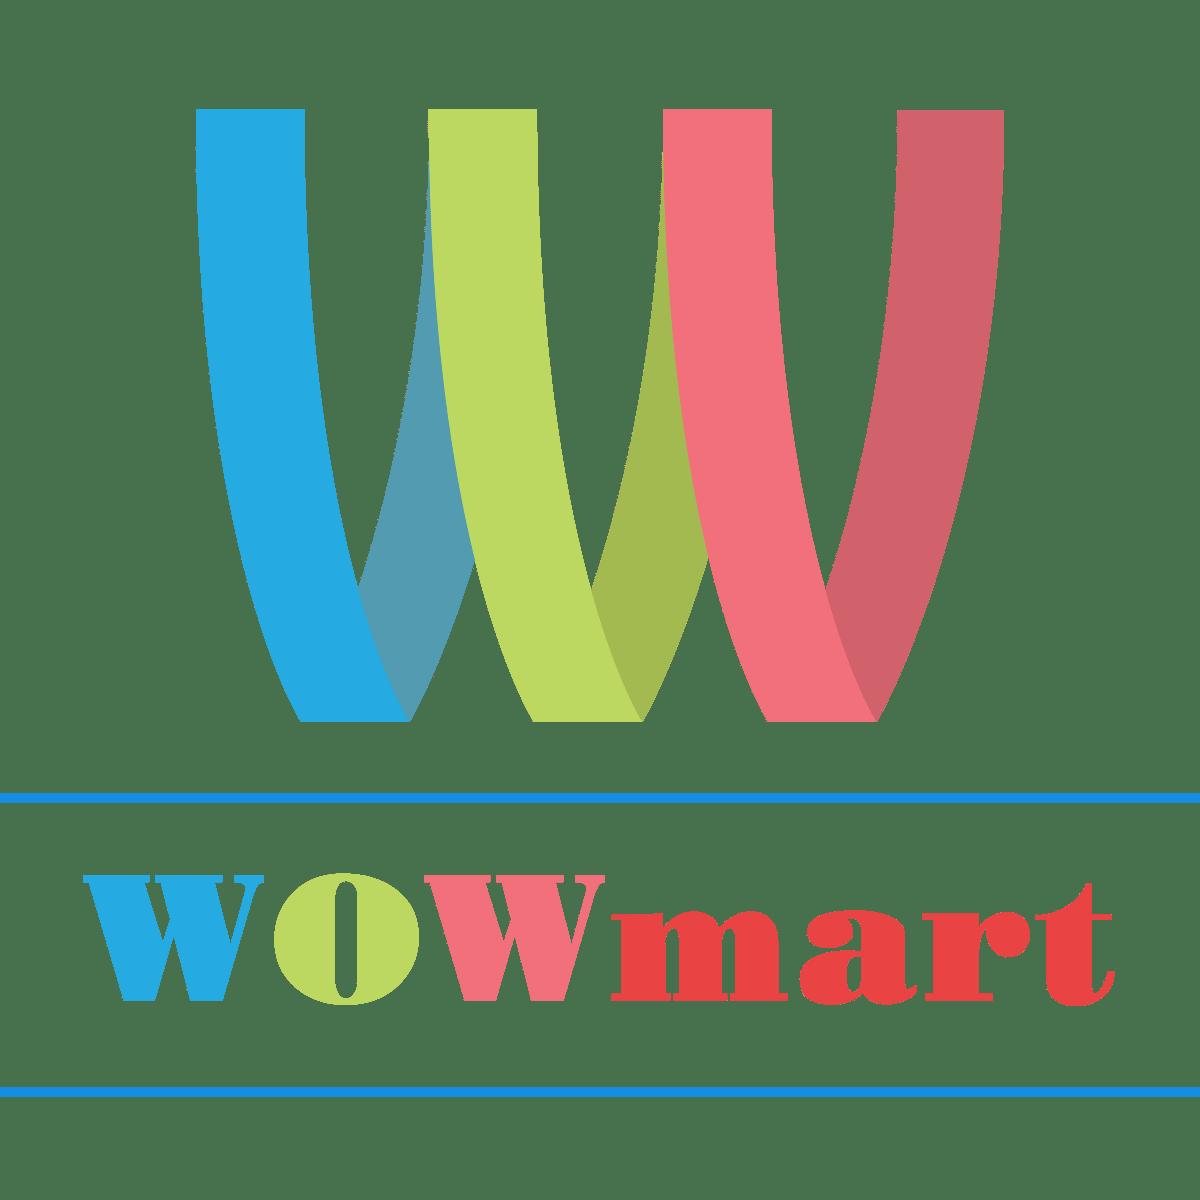 Logo Wowmart